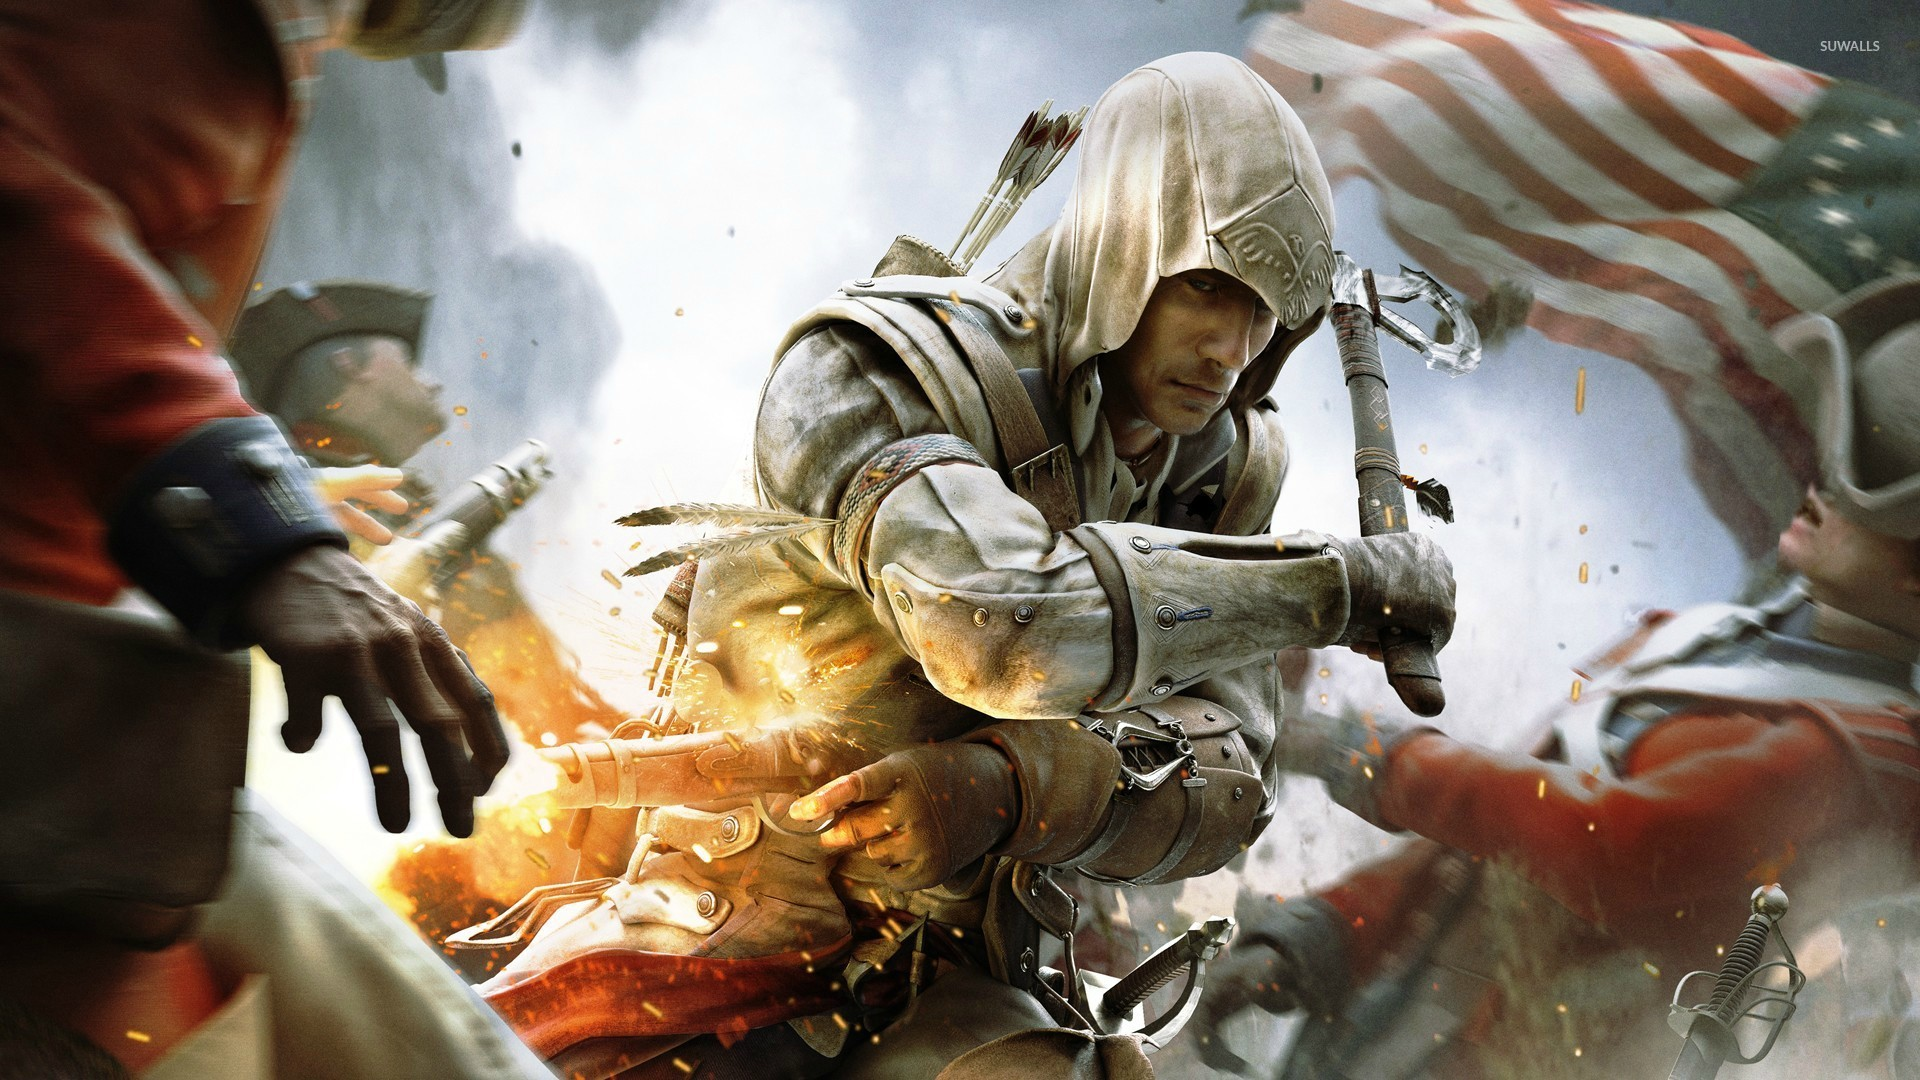 Assassins Creed III 4 Wallpaper 1920x1080 Jpg